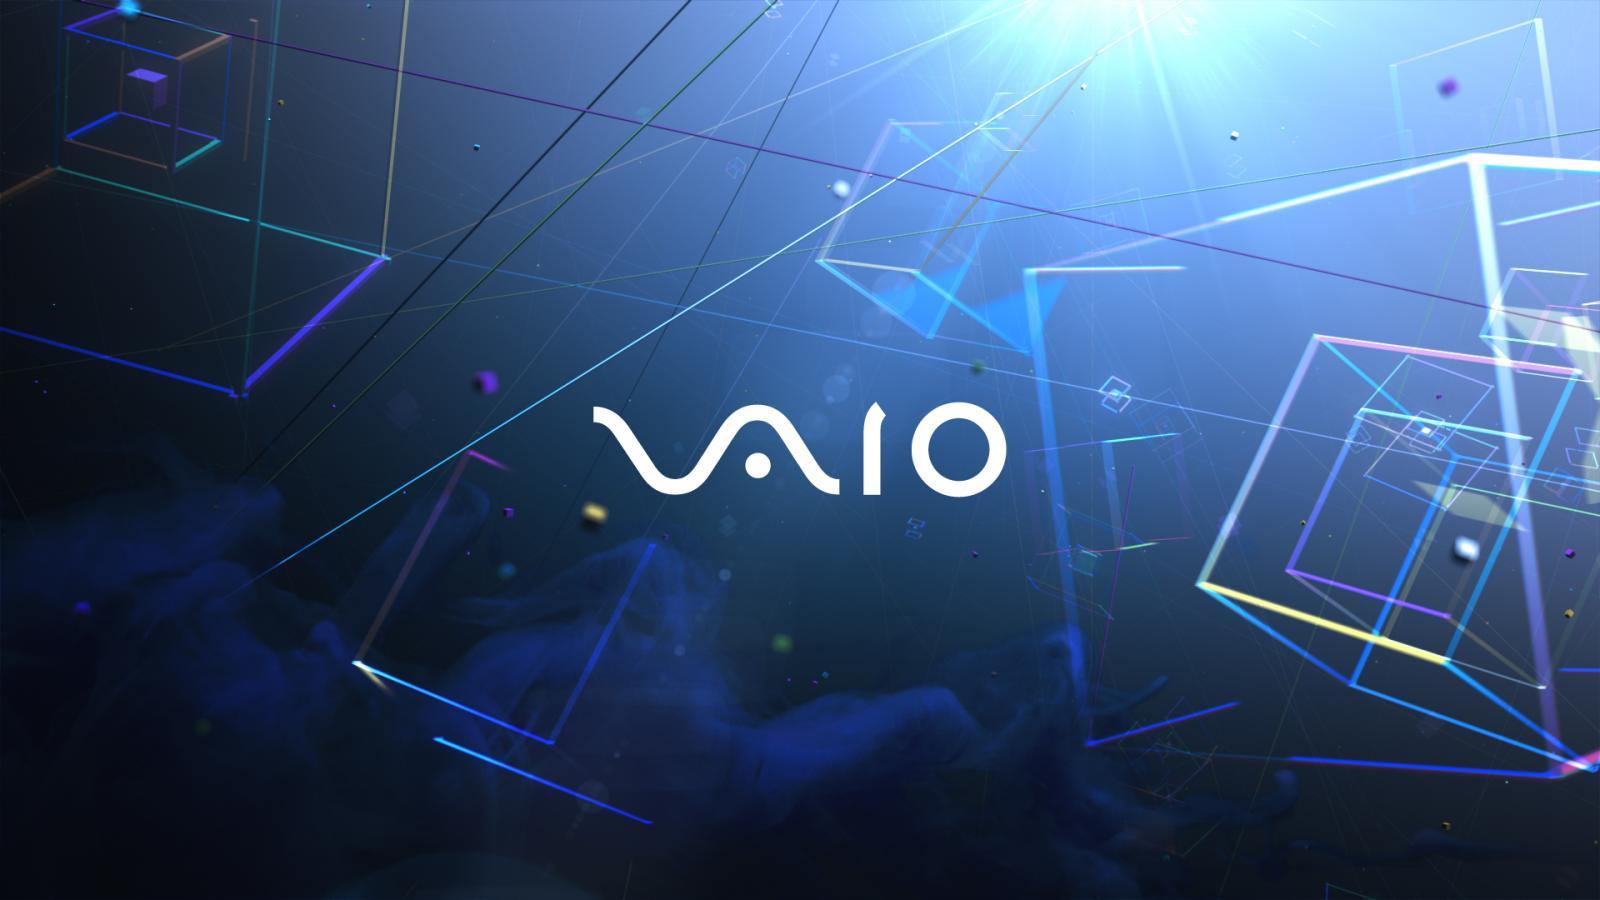 Vaio wallpaper 1920x1080 wallpapersafari - Sony vaio wallpaper 1280x800 ...